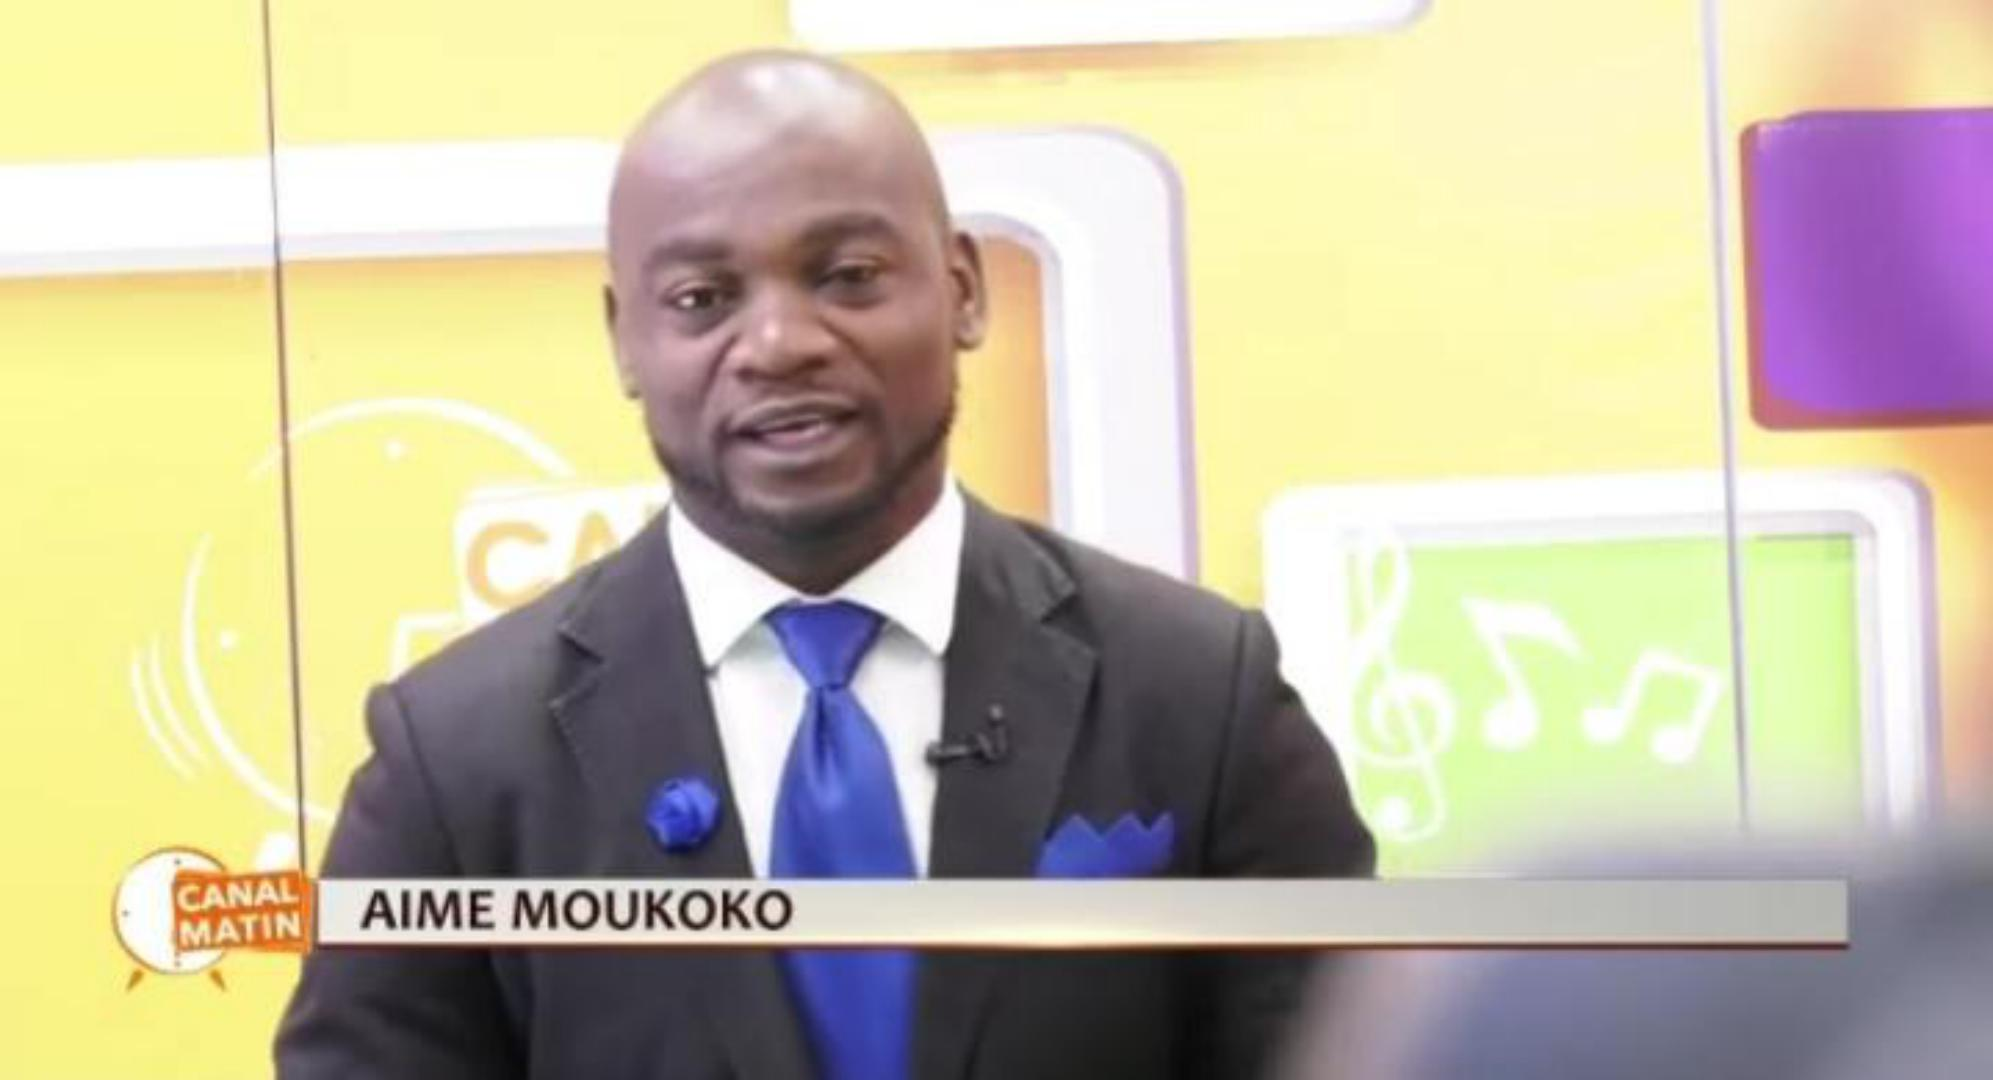 Aimé Moukoko quitte Canal 2 international